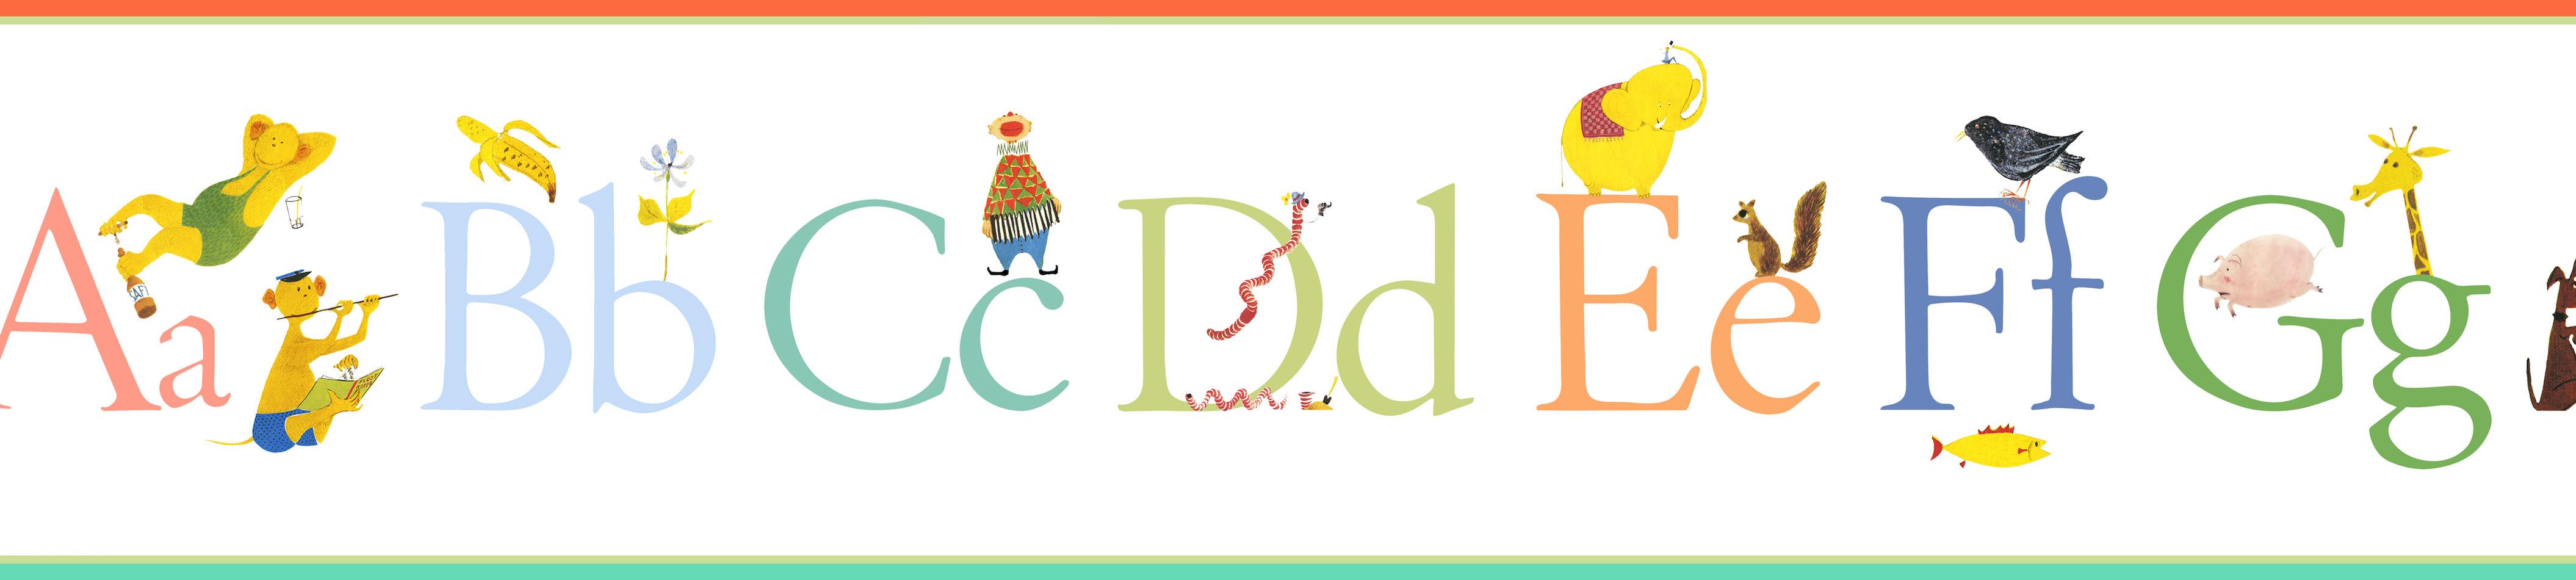 Tienda online telas papel cenefa infantil abecedario - Telas infantiles online ...